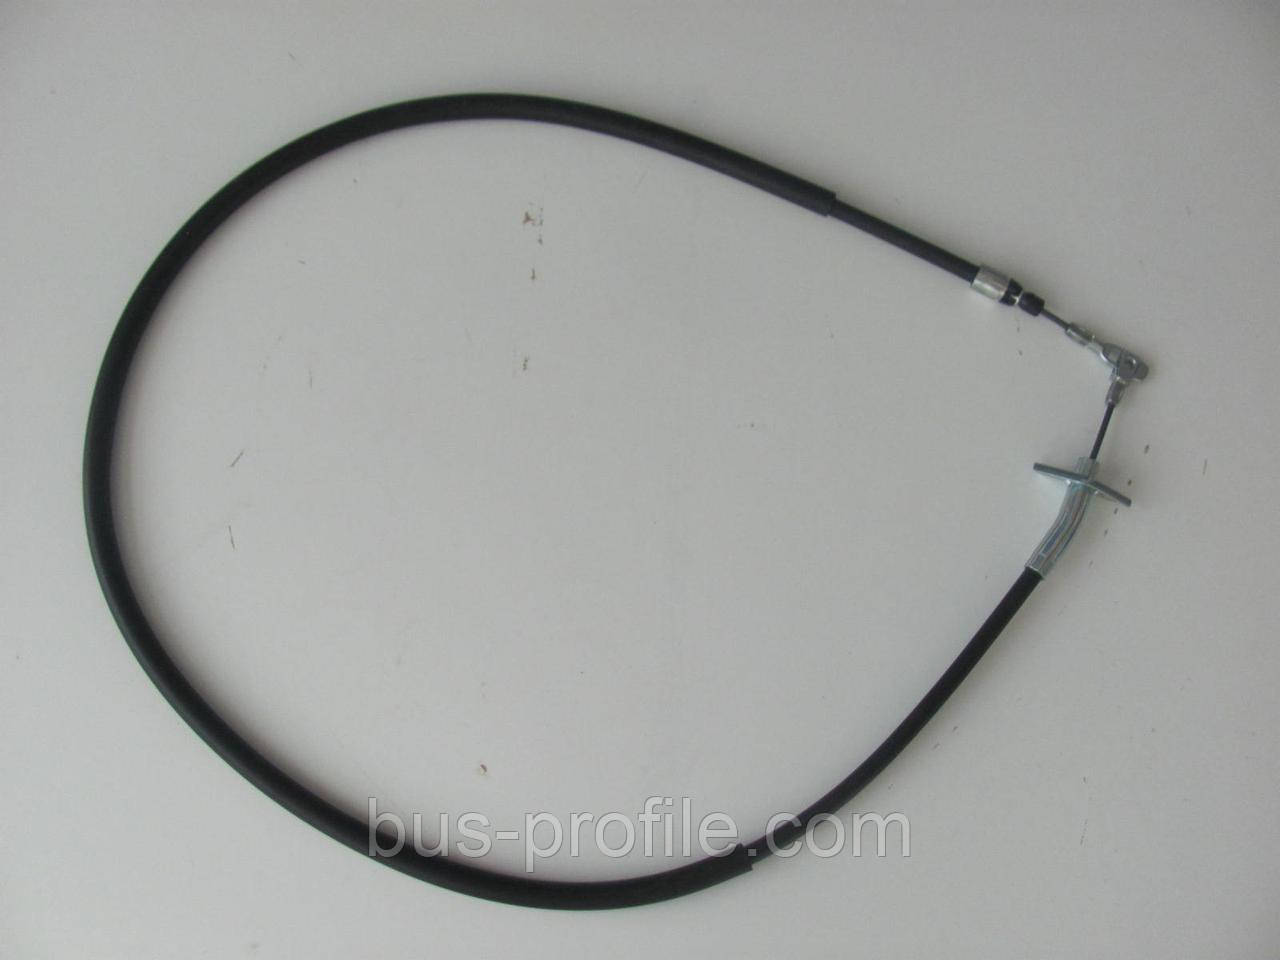 Трос ручника MB Sprinter 408-416/VW LT 46 96- L (1525/1350) — LINEX — 27.01.73